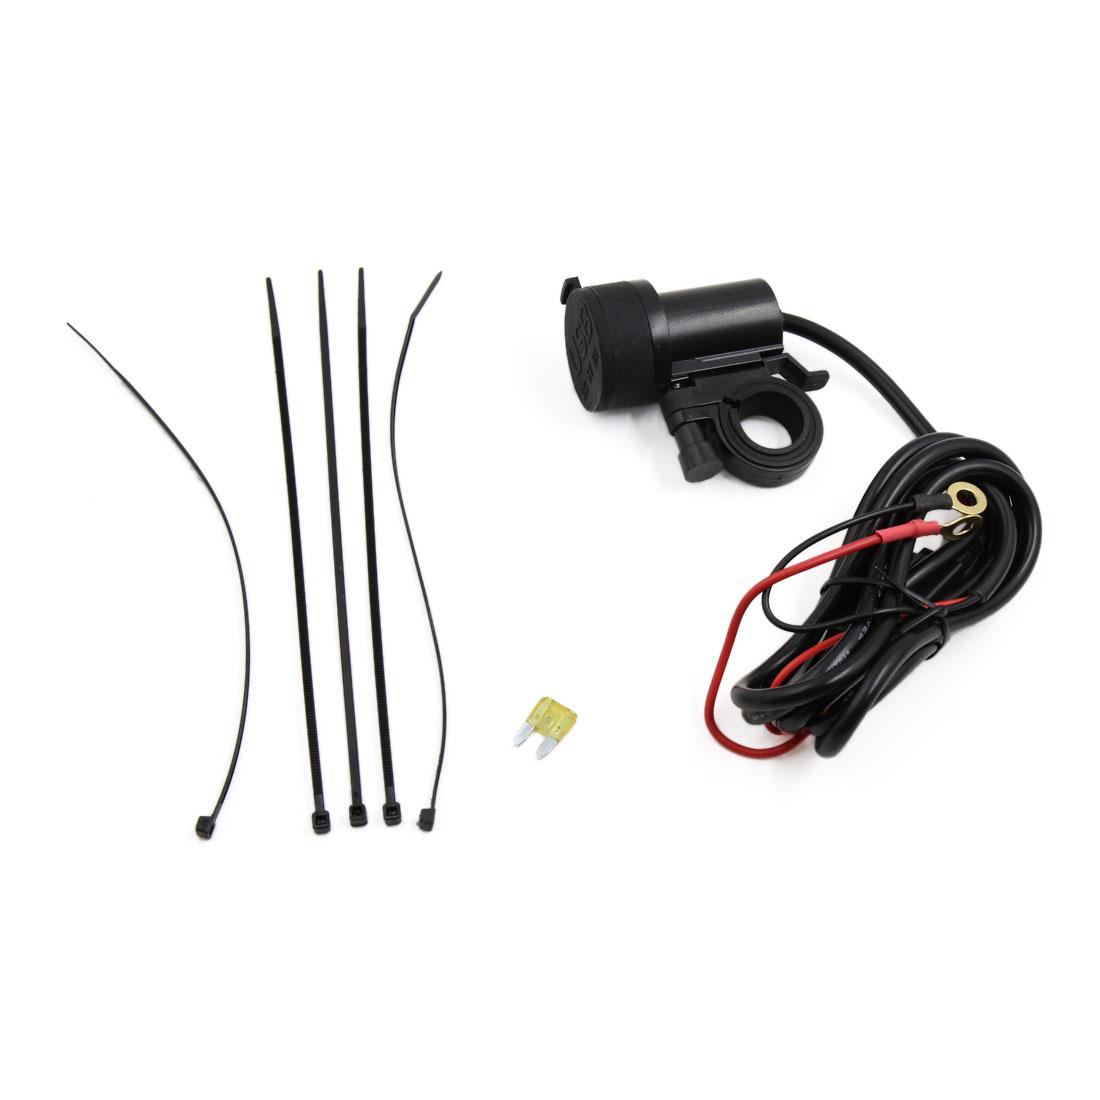 Black Plastic Cigarette Lighter Blue LED Dual USB Charger Power Adapter 2.1A 5V